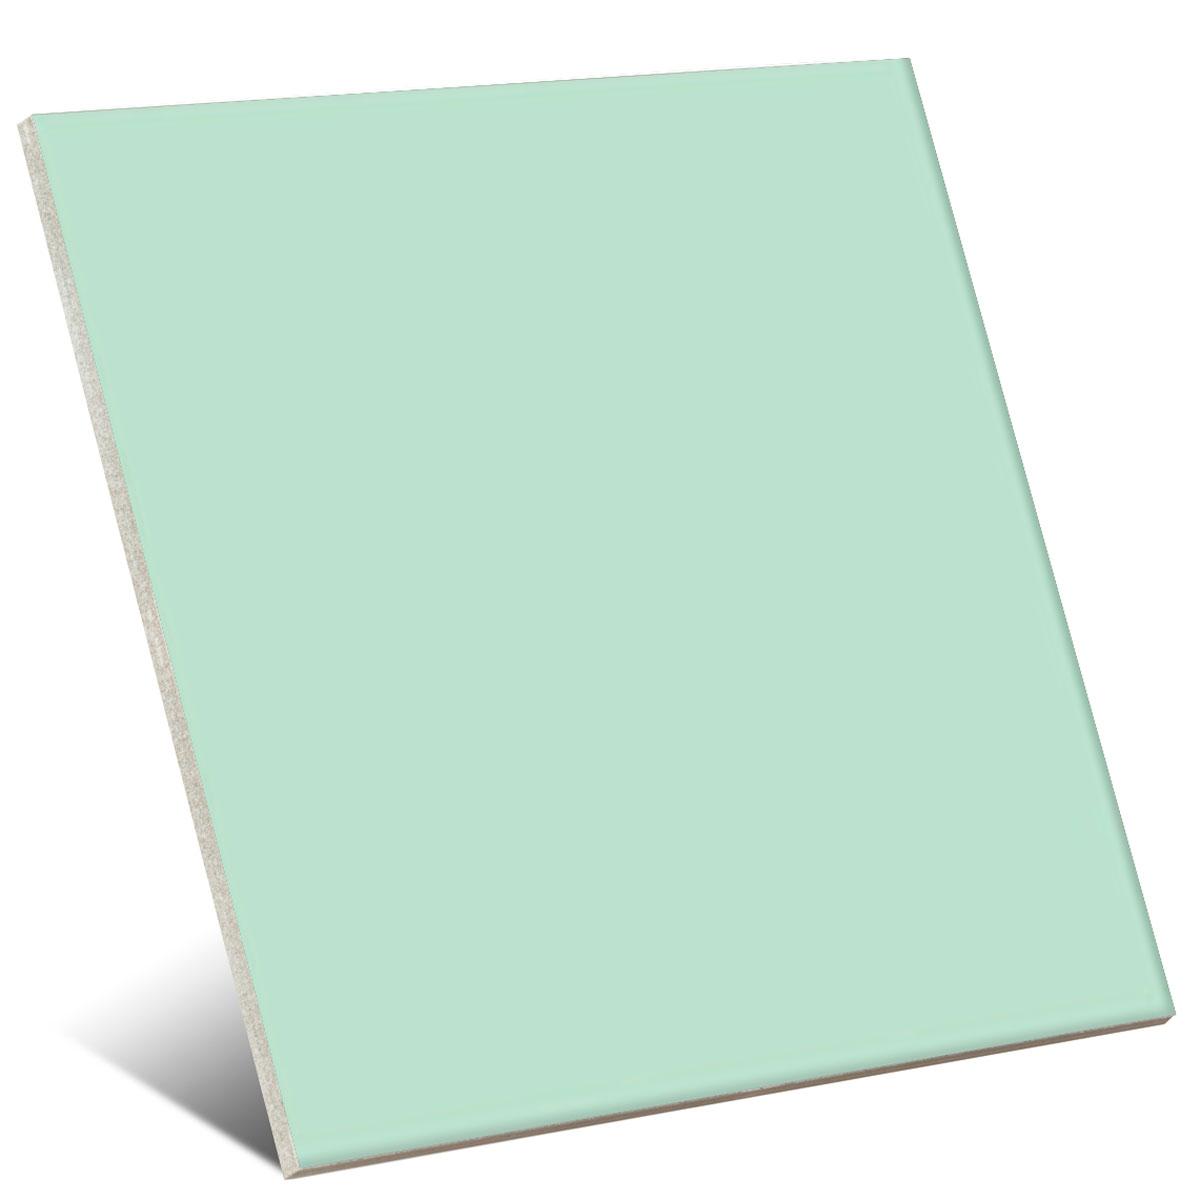 Color Verde Pastel Brillo 20x20 cm (caja 1 m2)